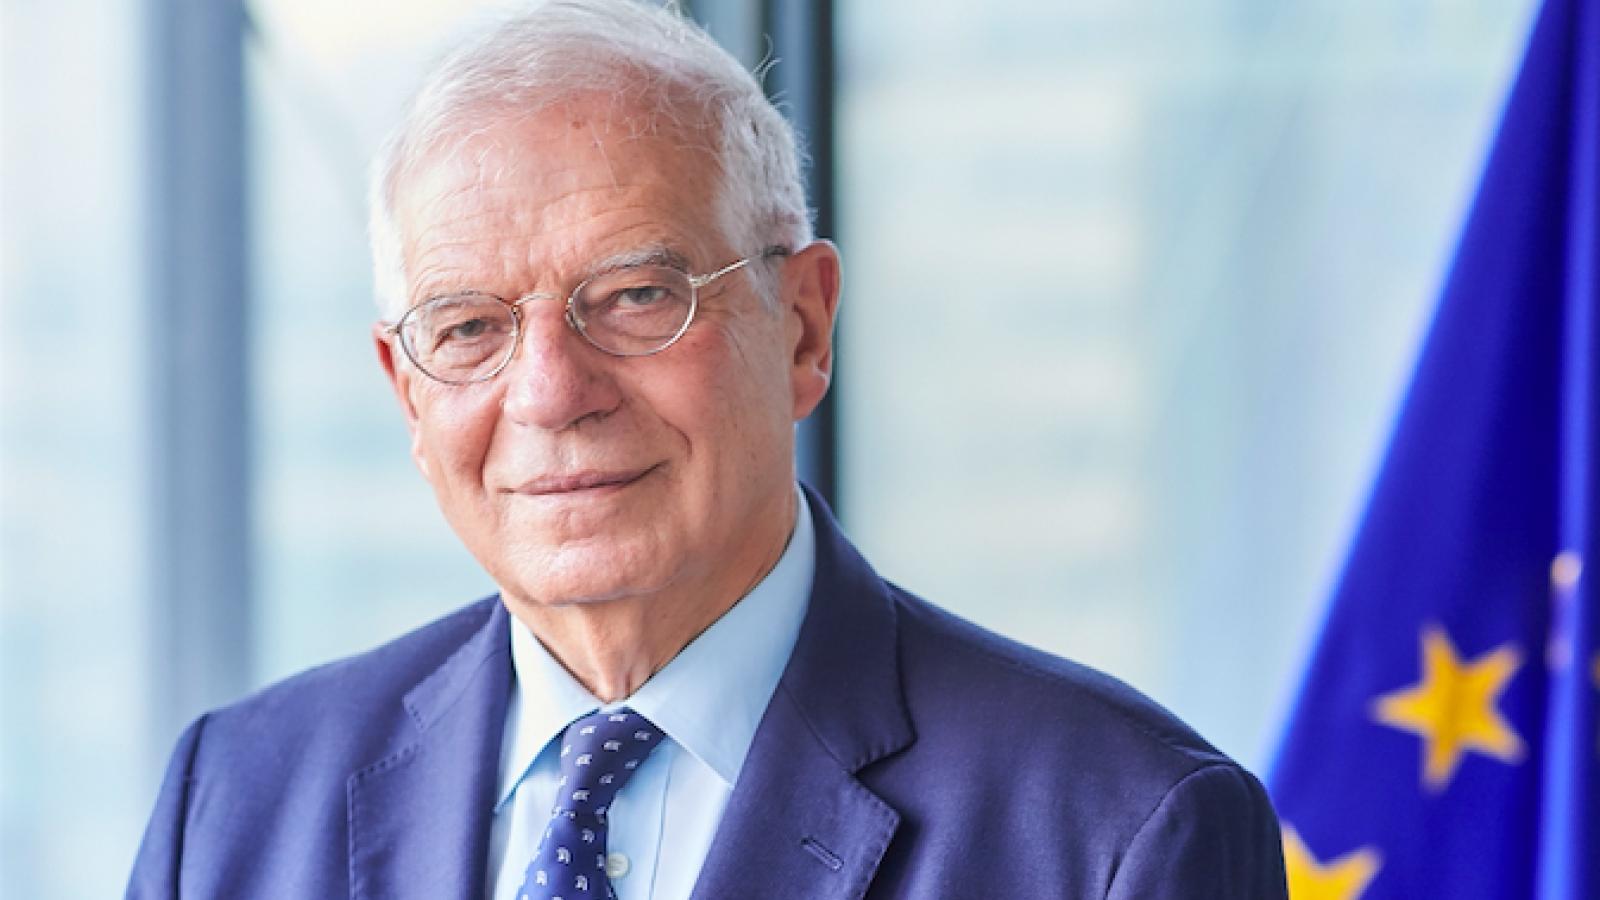 HR/VP Josep Borrell